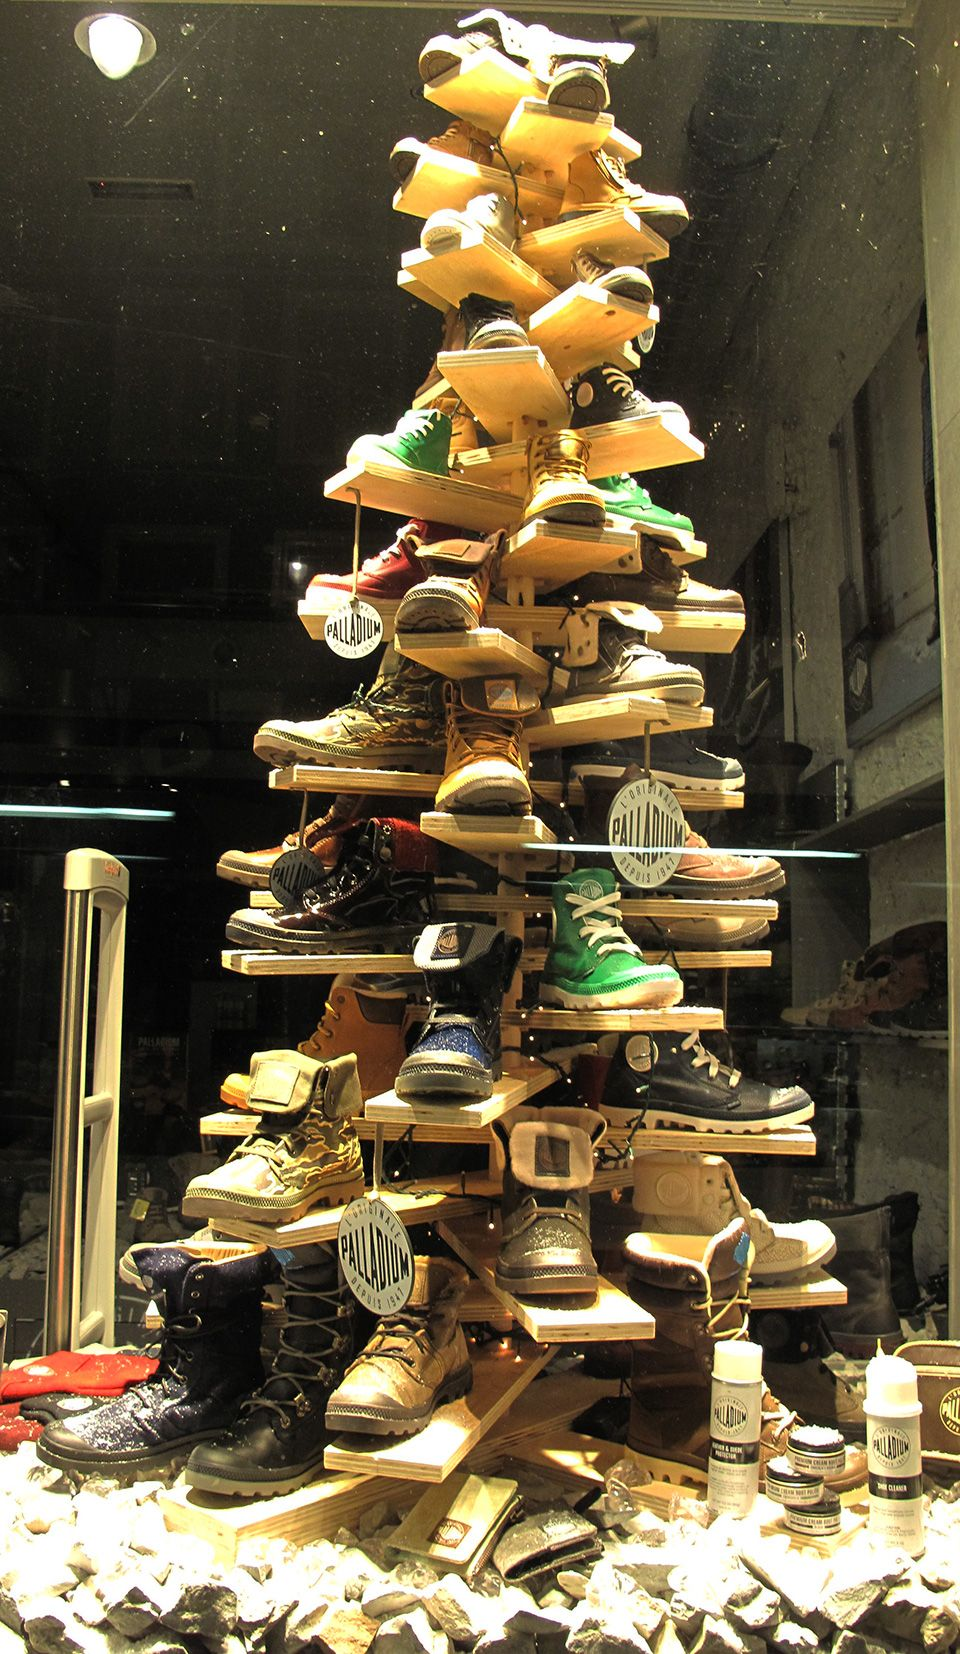 Shoe xmas tree pinned by ton van der veer dekoration schaufenster schaufensterdekoration - Schaufensterdekoration weihnachten ...